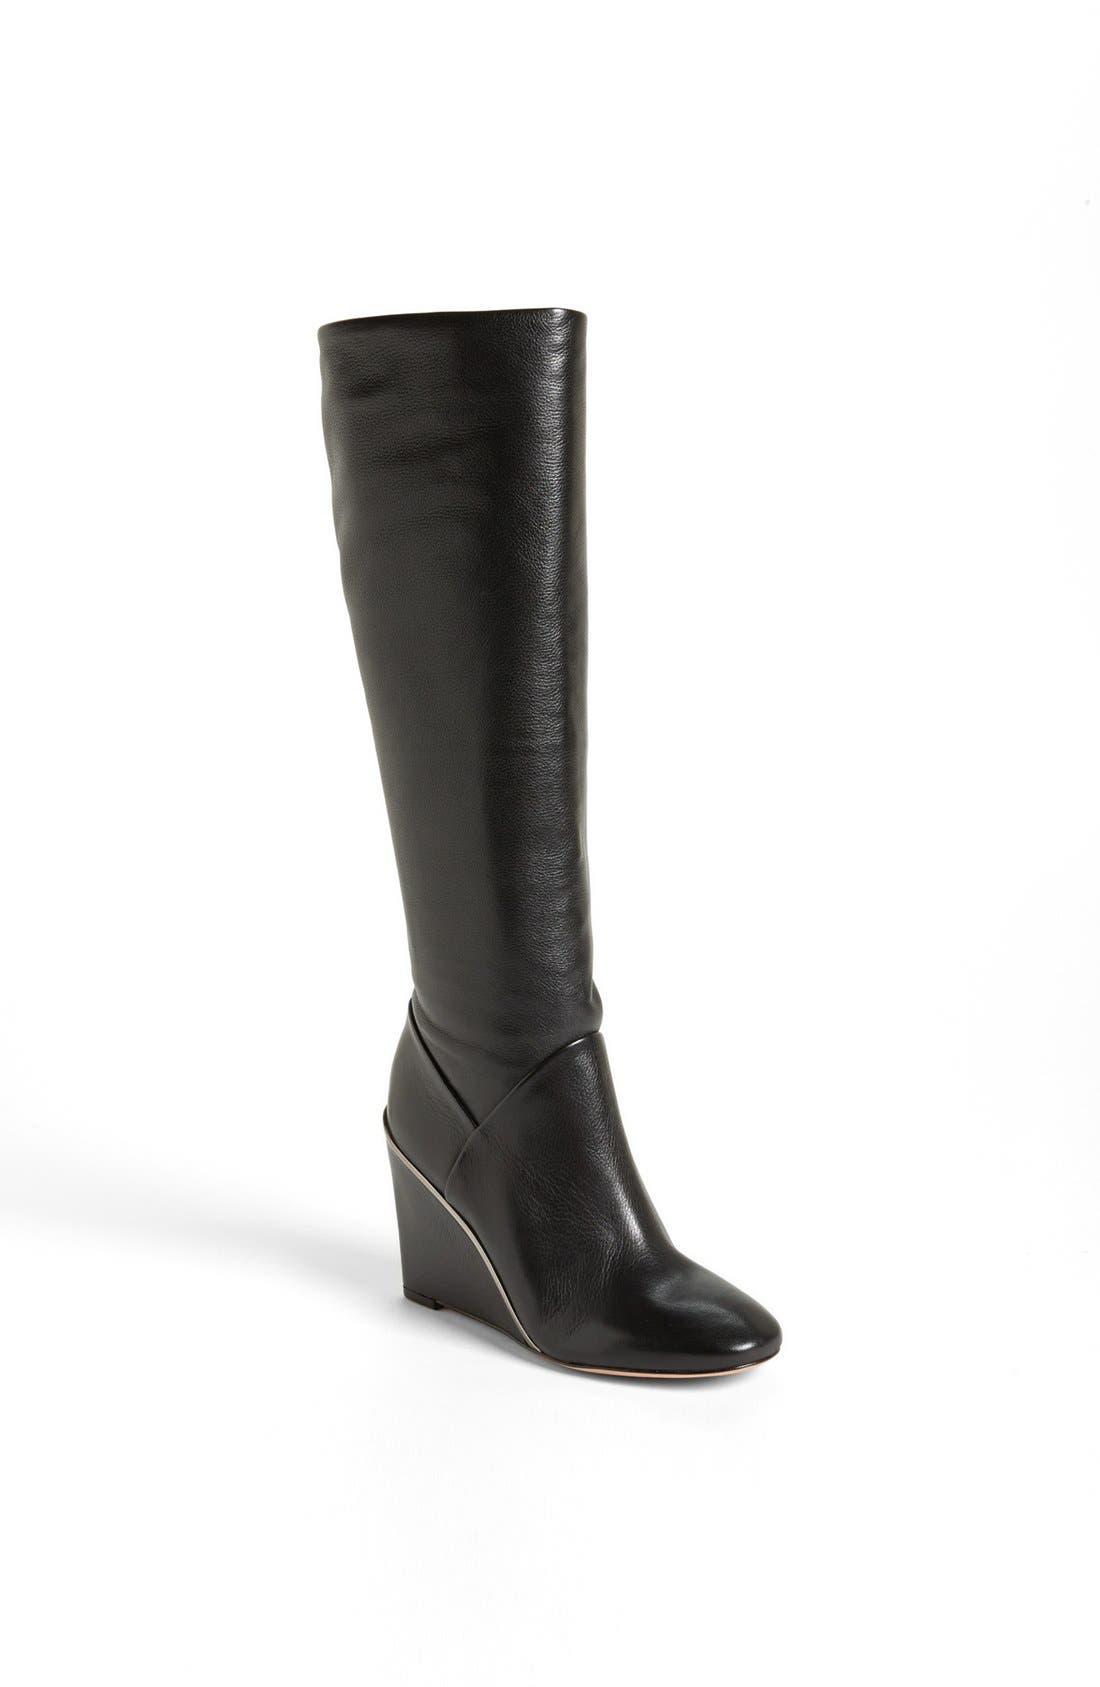 Alternate Image 1 Selected - Diane von Furstenberg 'Paula' Boot (Online Only)